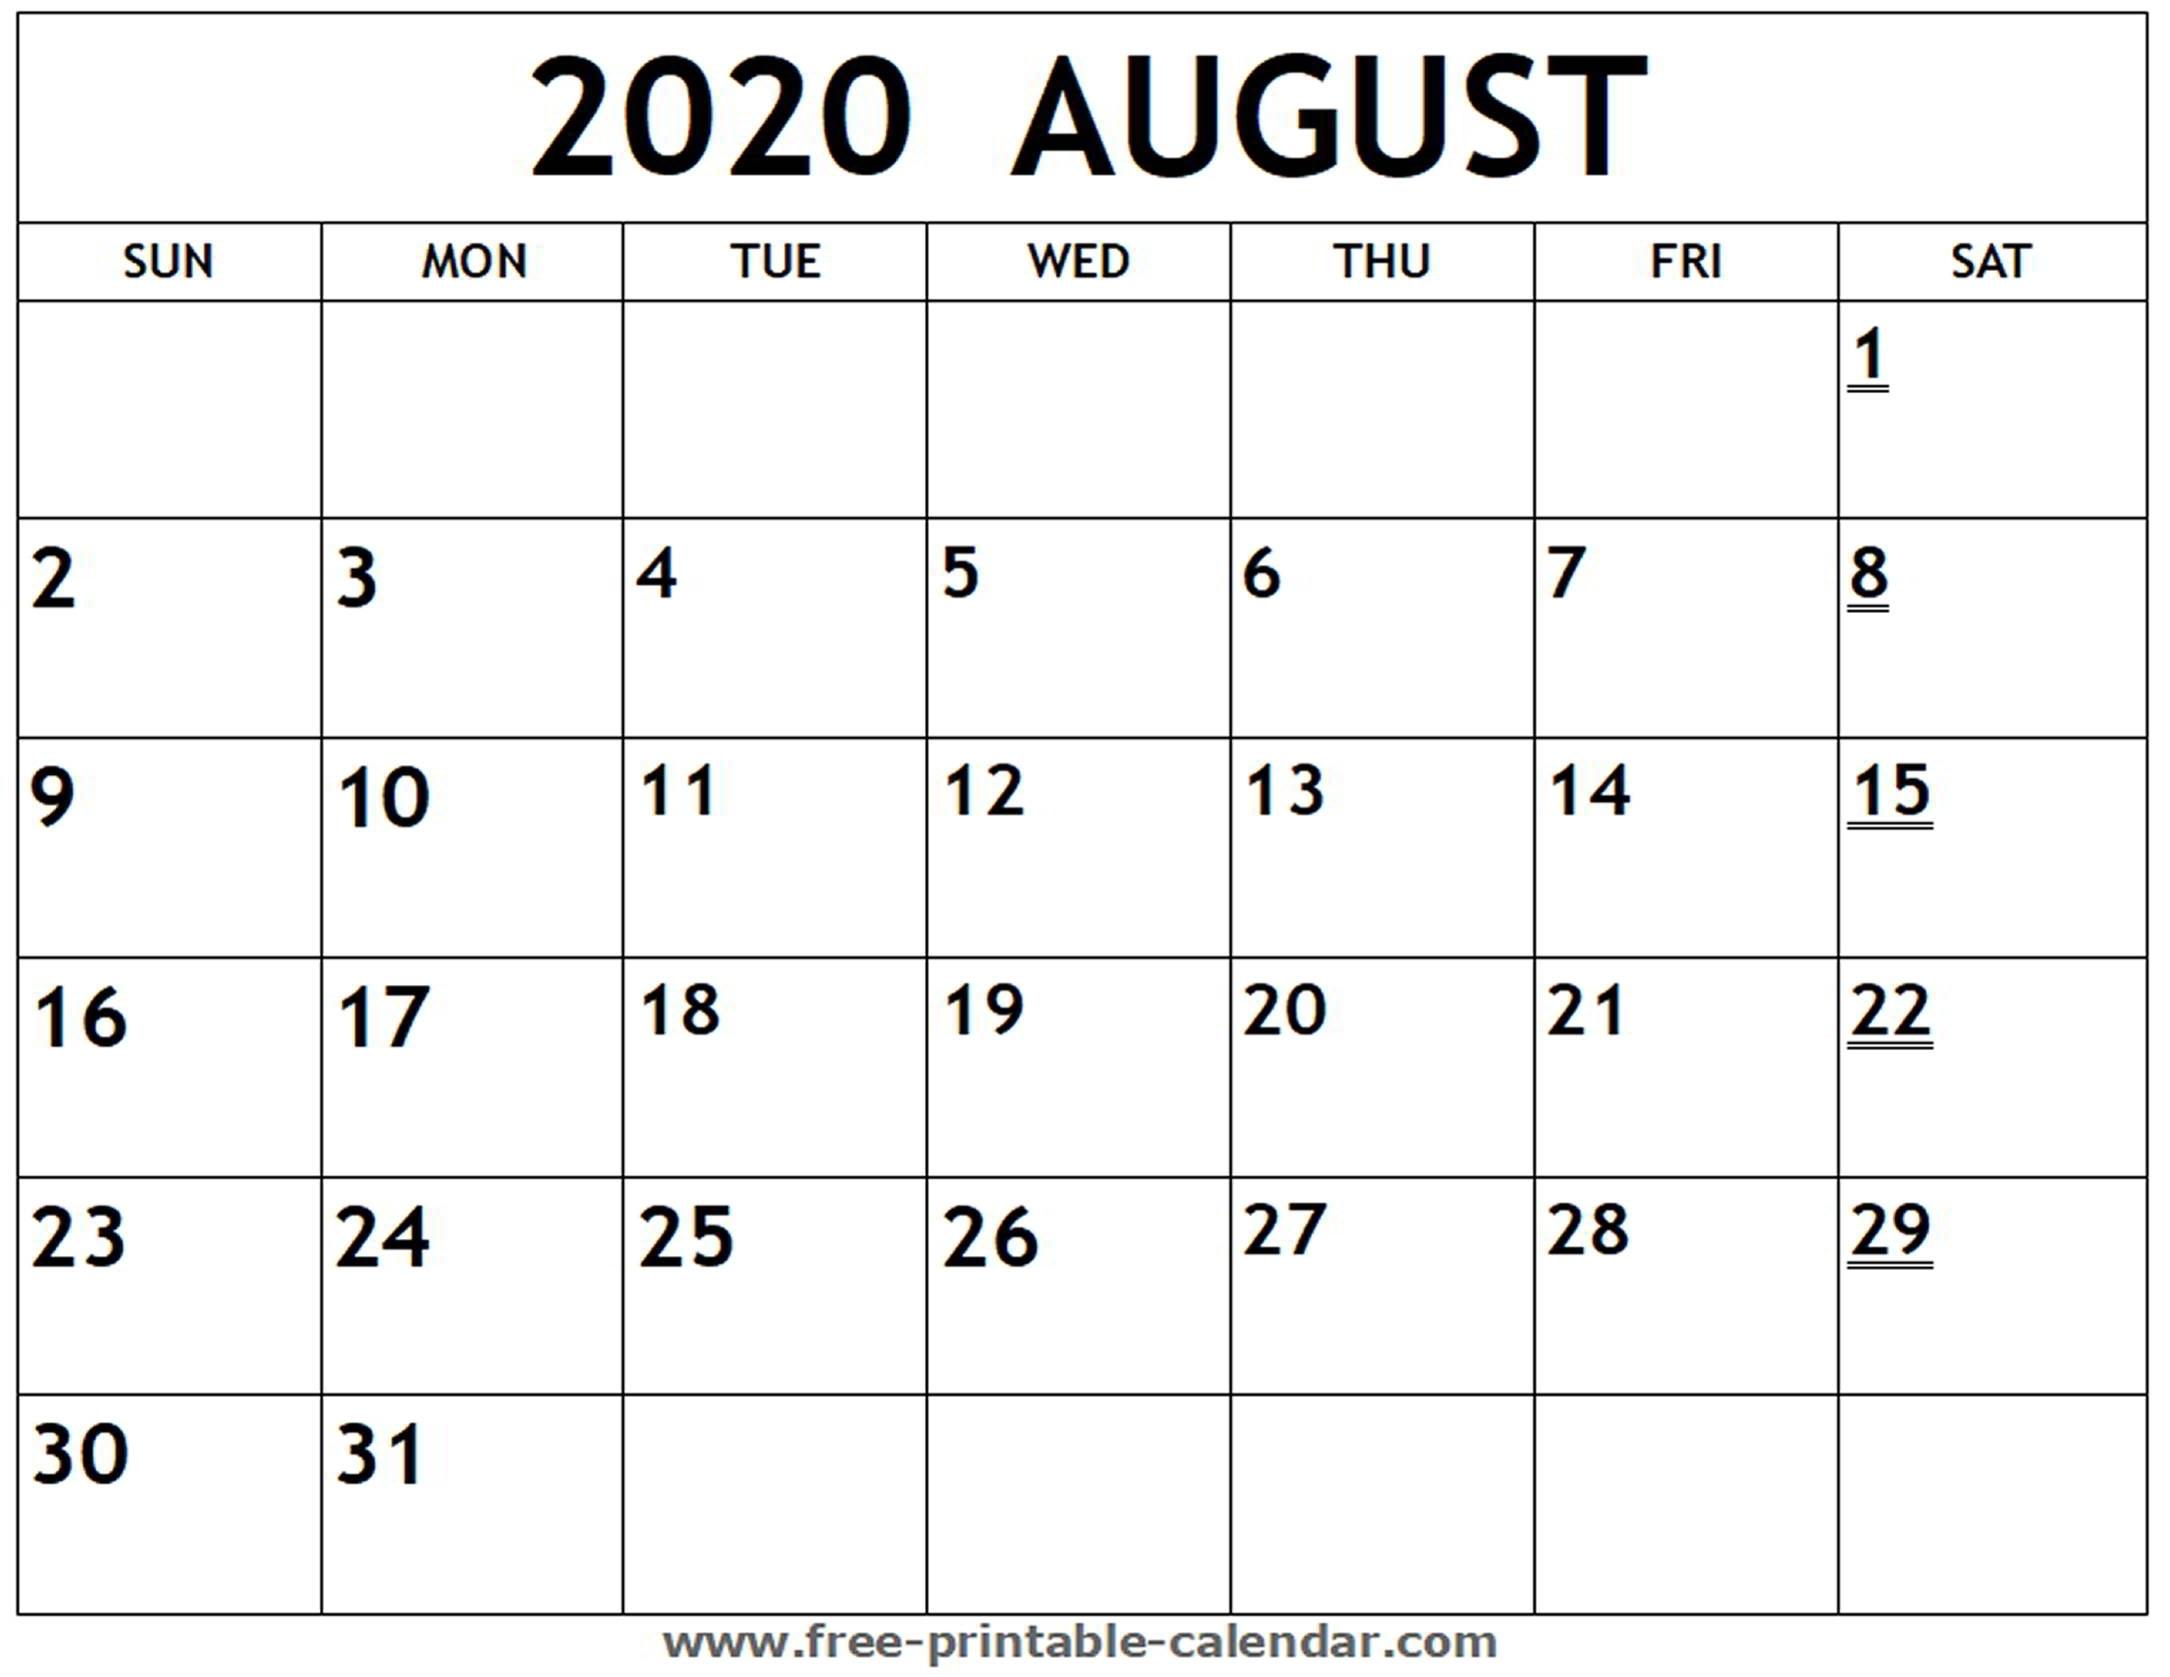 Printable 2020 August Calendar - Free-Printable-Calendar